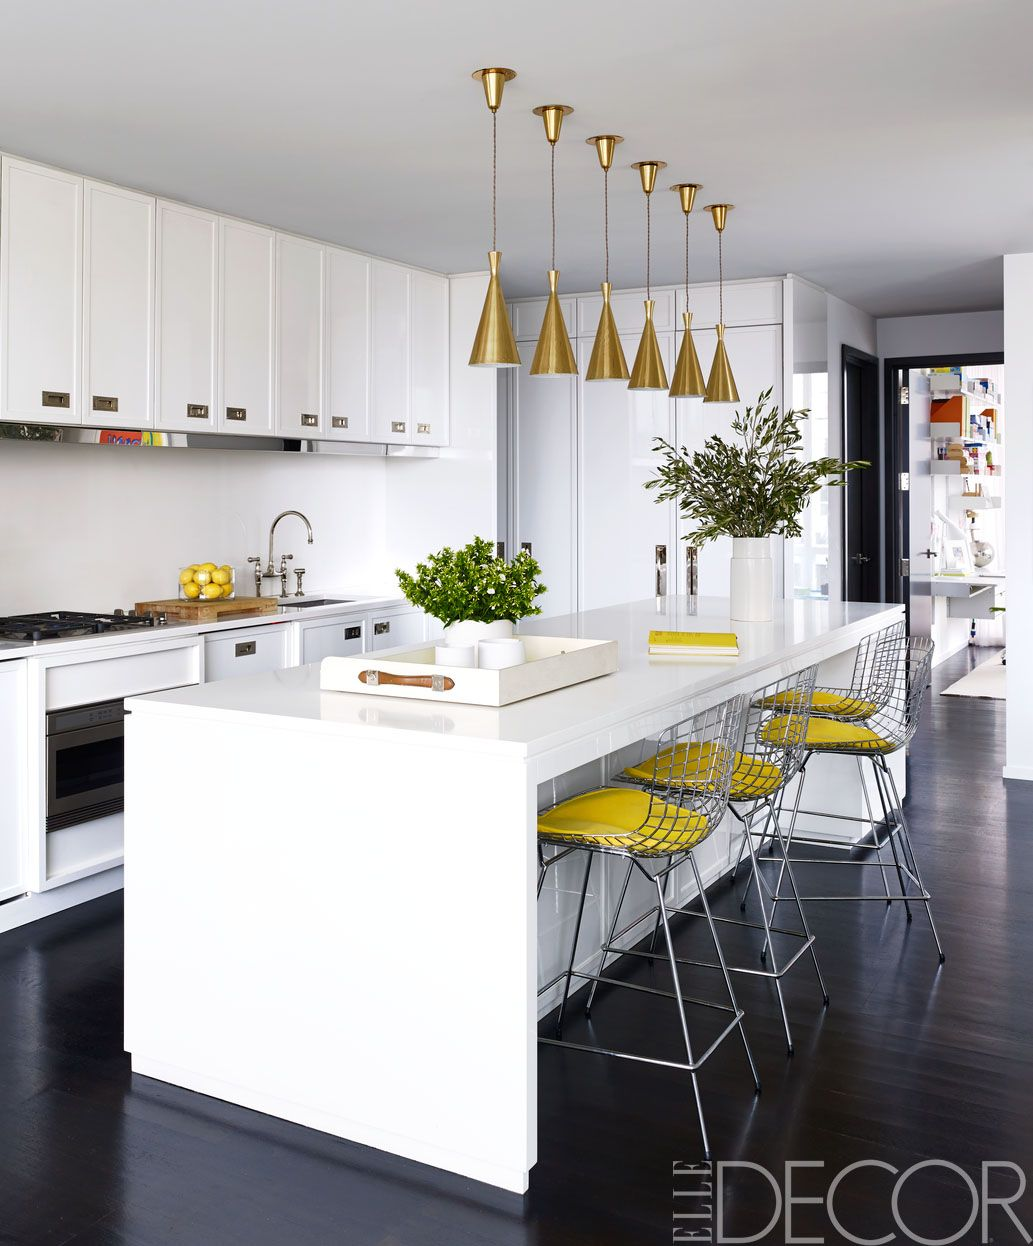 Best White Kitchens Design Ideas Pictures Of White Kitchen Decor Elledecor Com